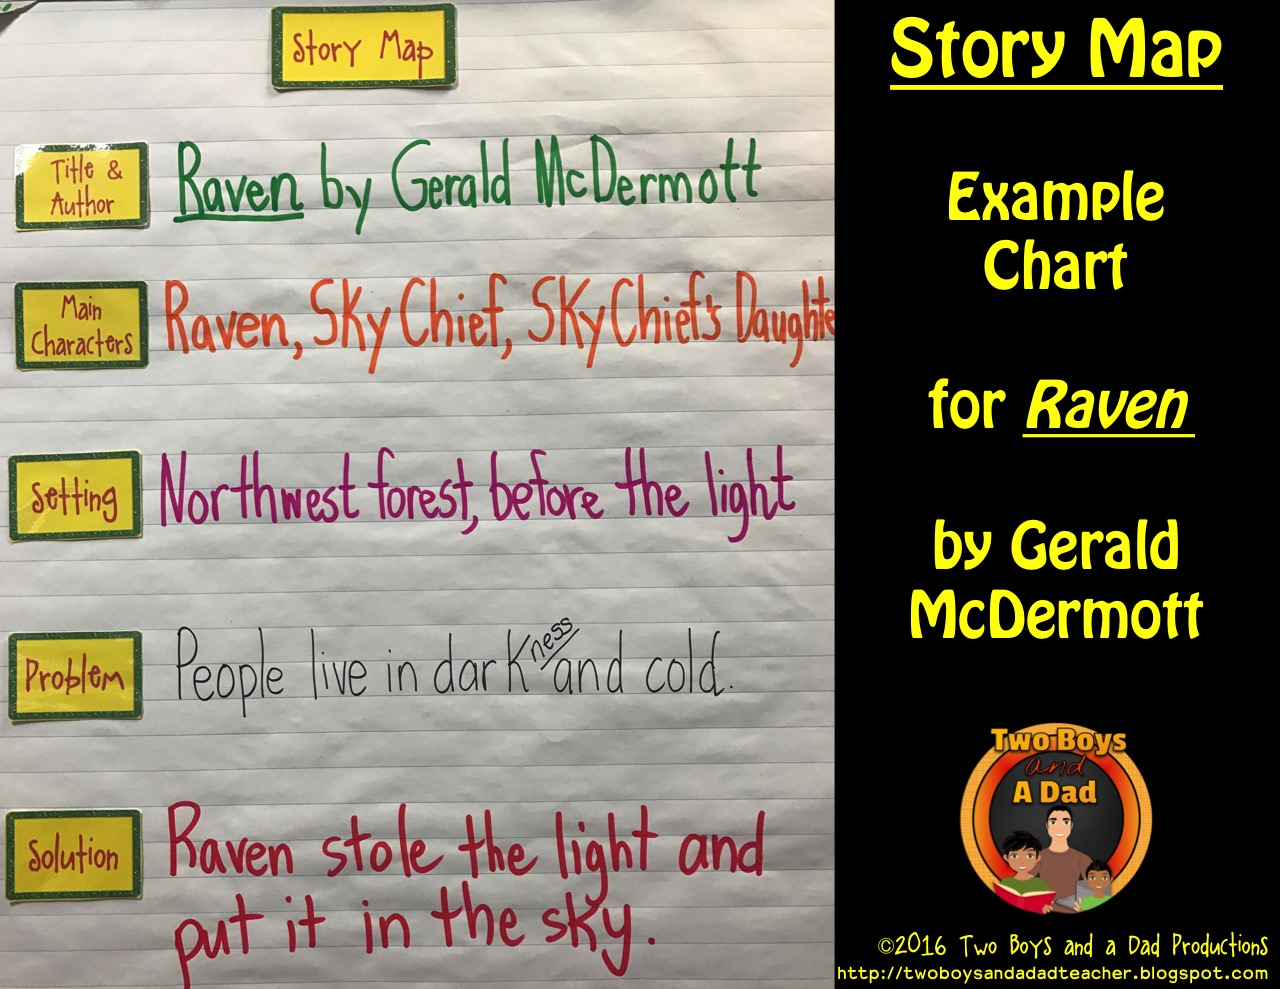 Gerald McDermott story map to teach the literature standards